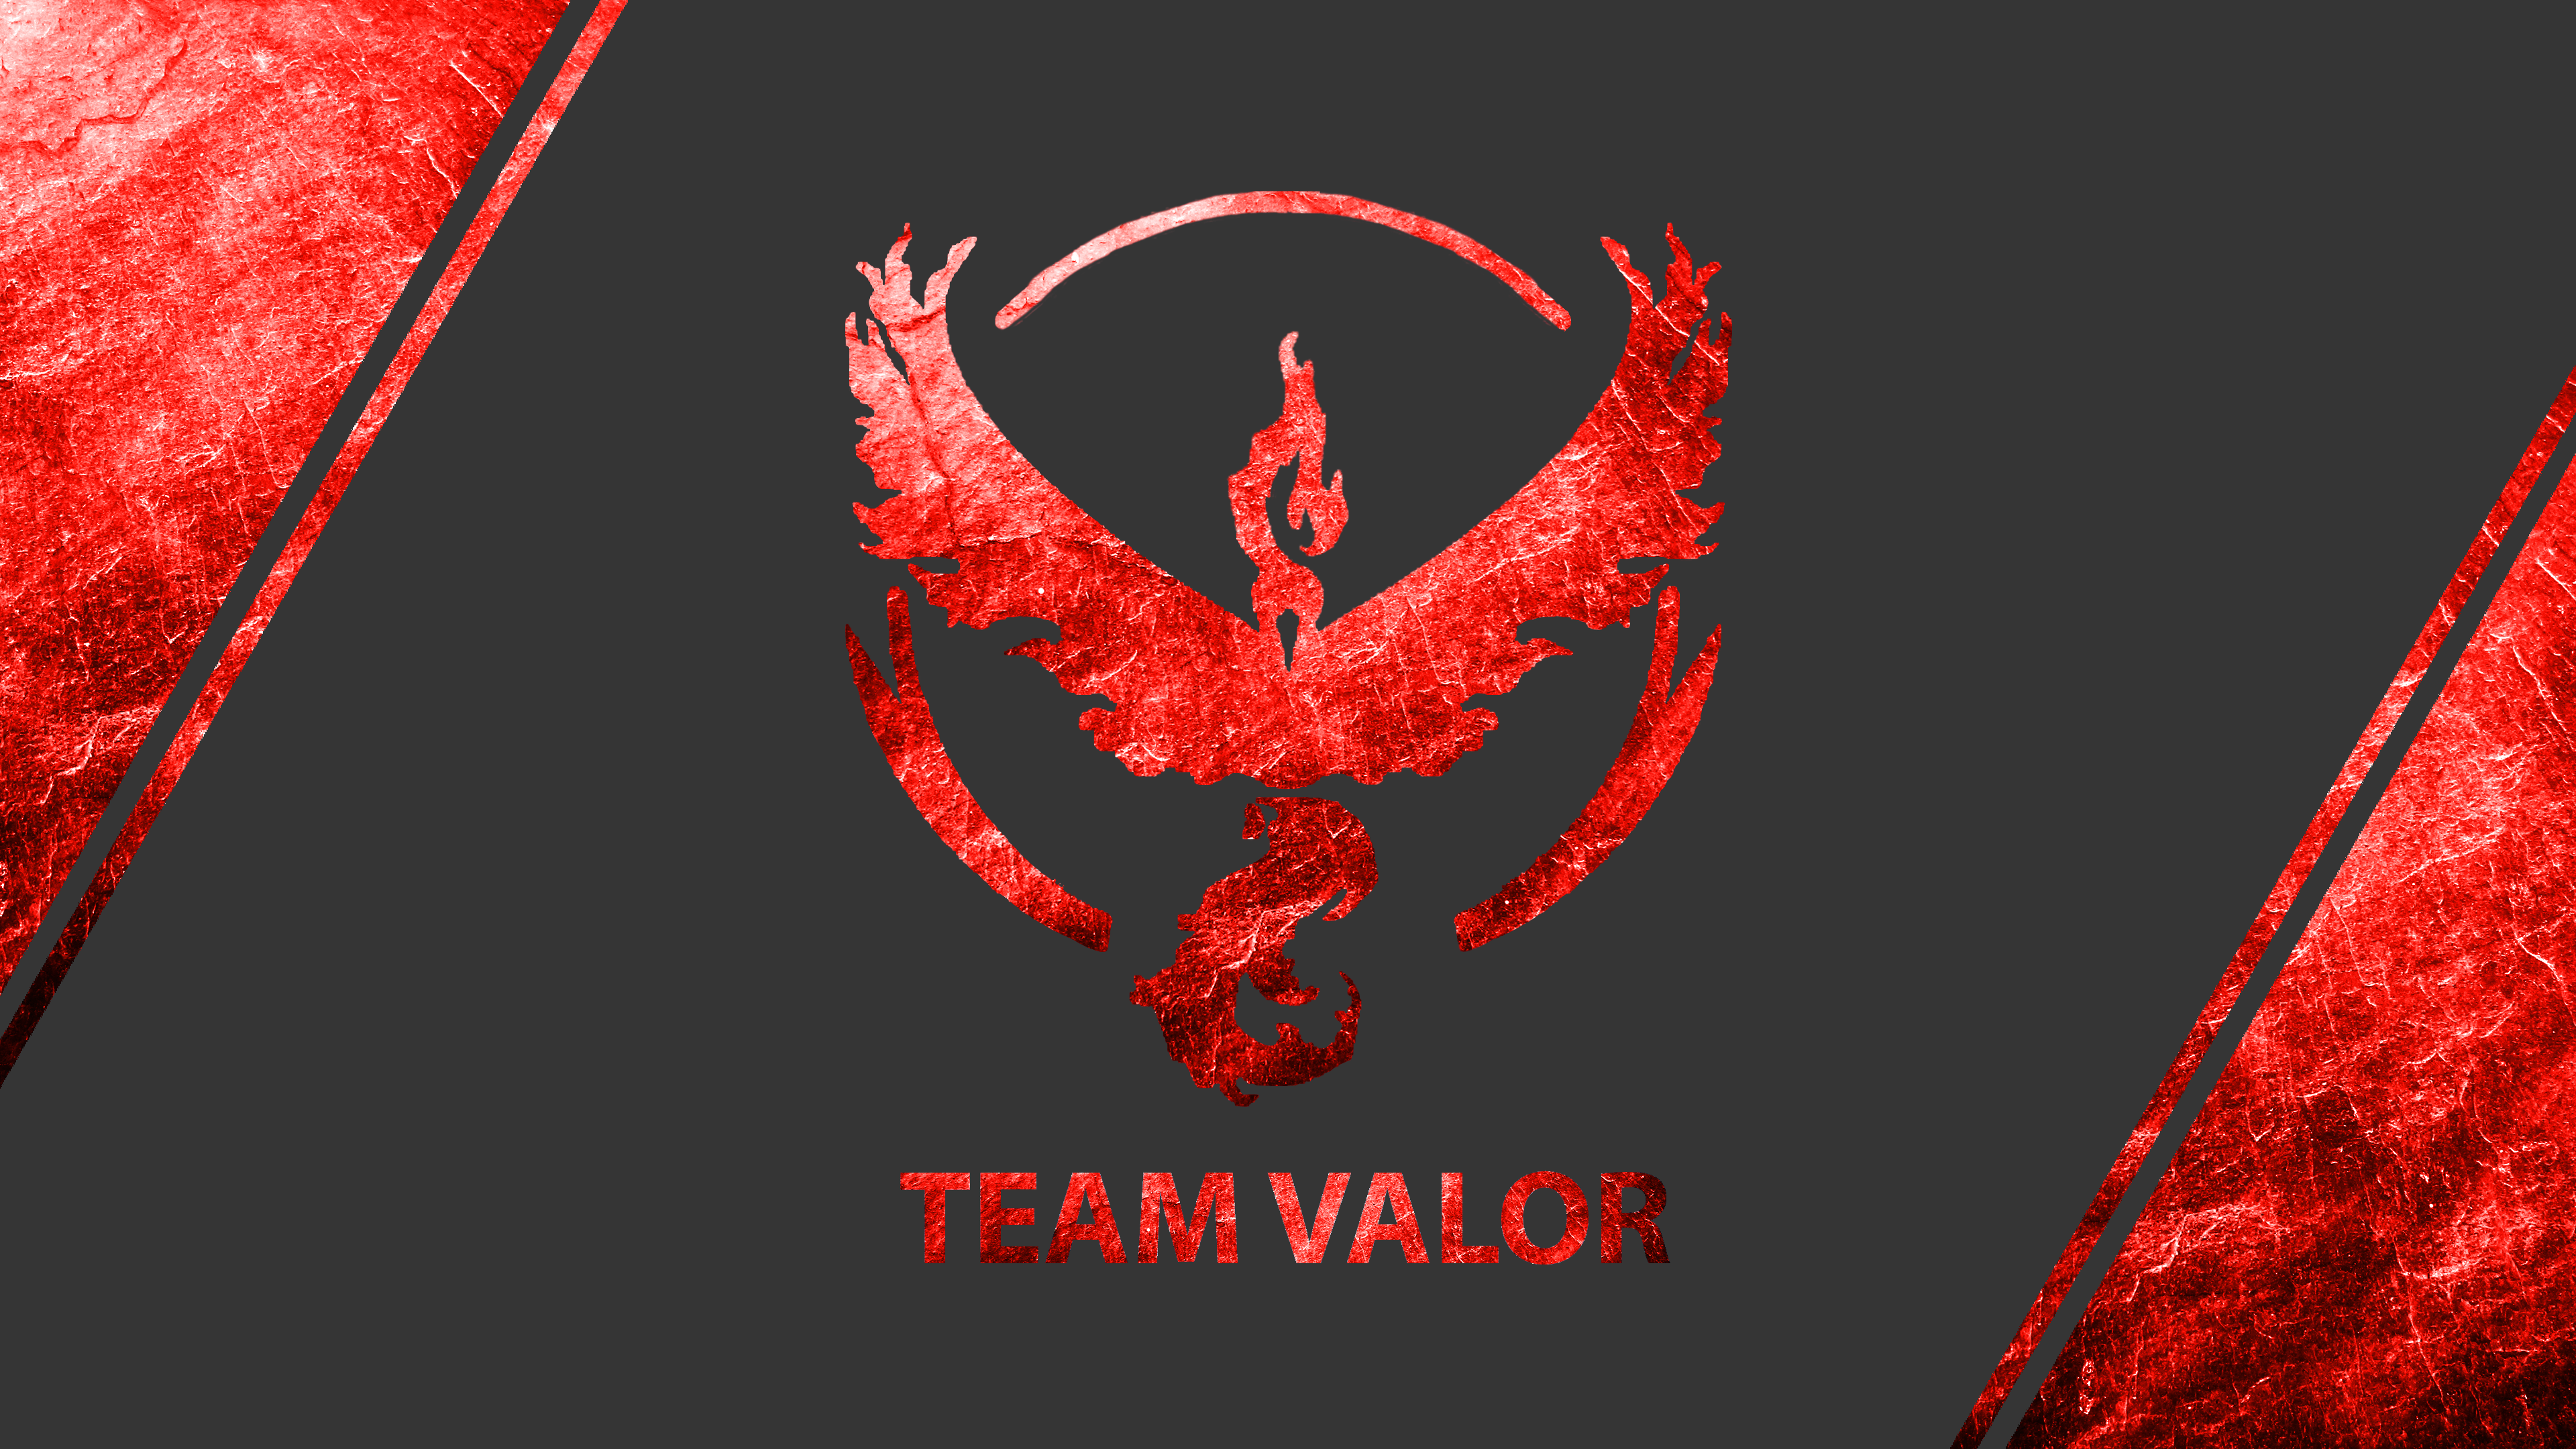 Team Valor Wallpaper Texture